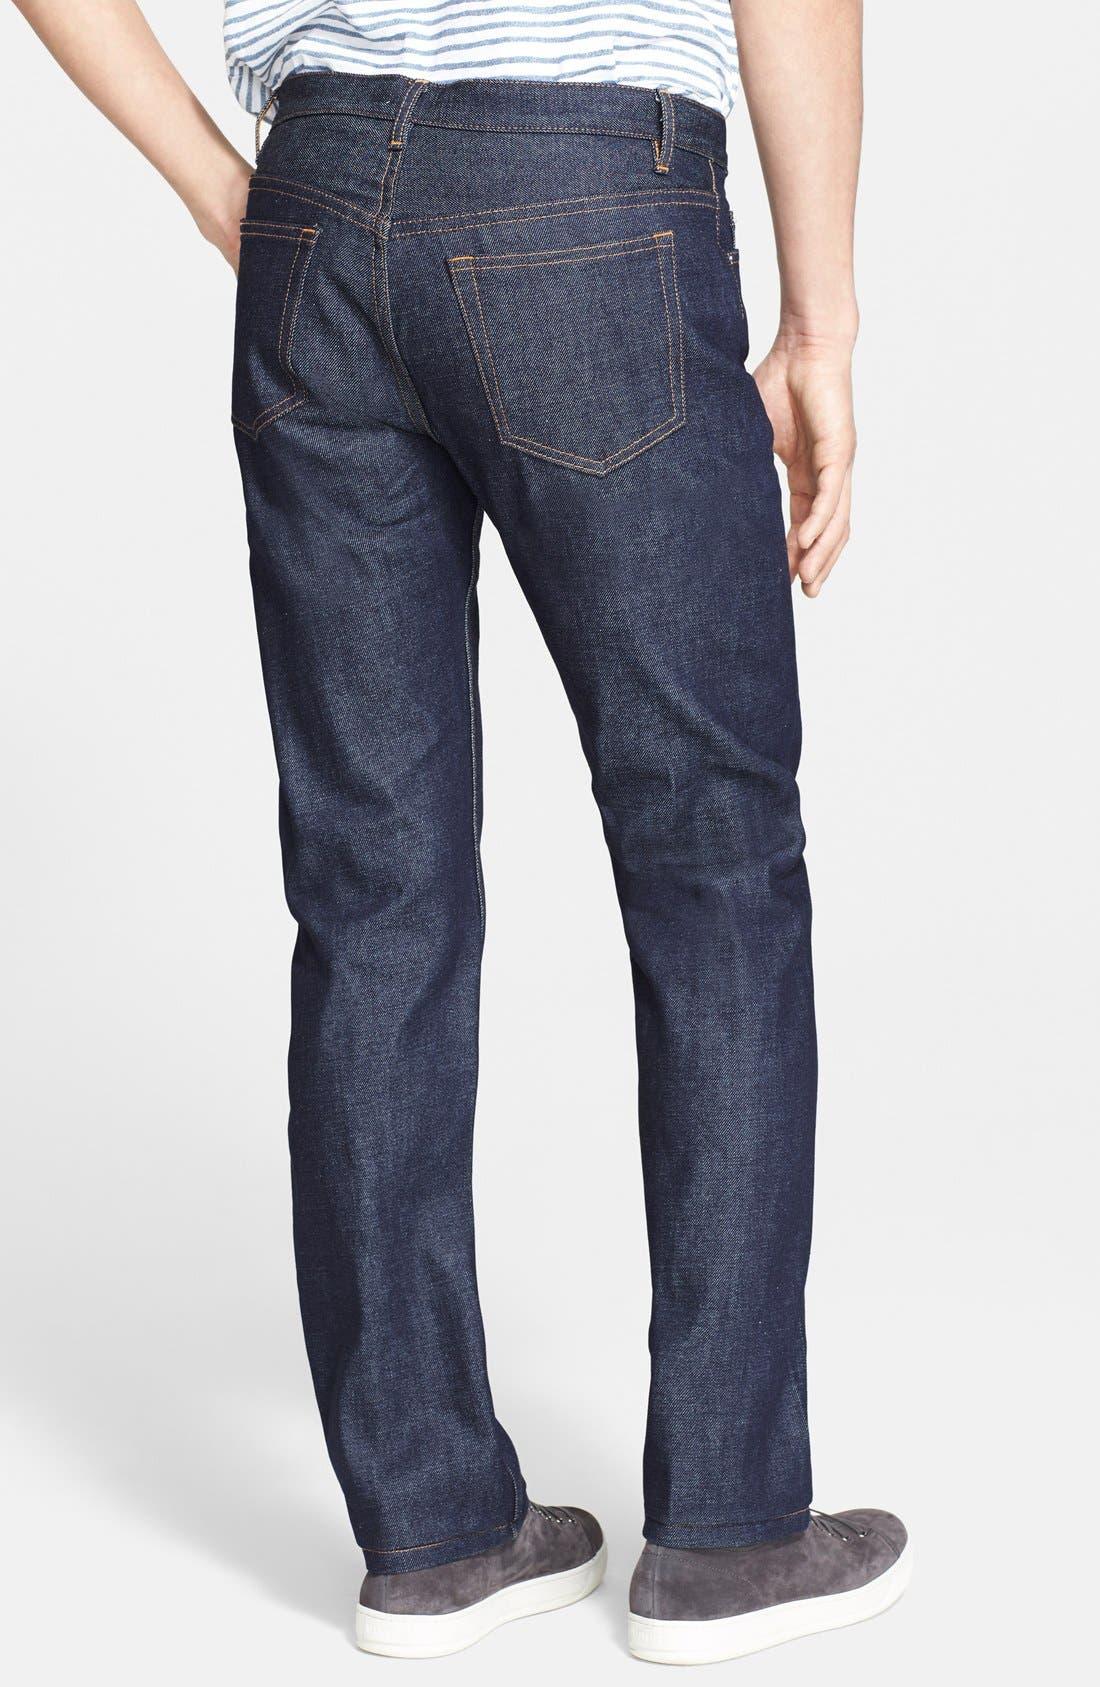 New Standard Slim Straight Leg Raw Selvedge Jeans,                             Alternate thumbnail 3, color,                             INDIGO WASH